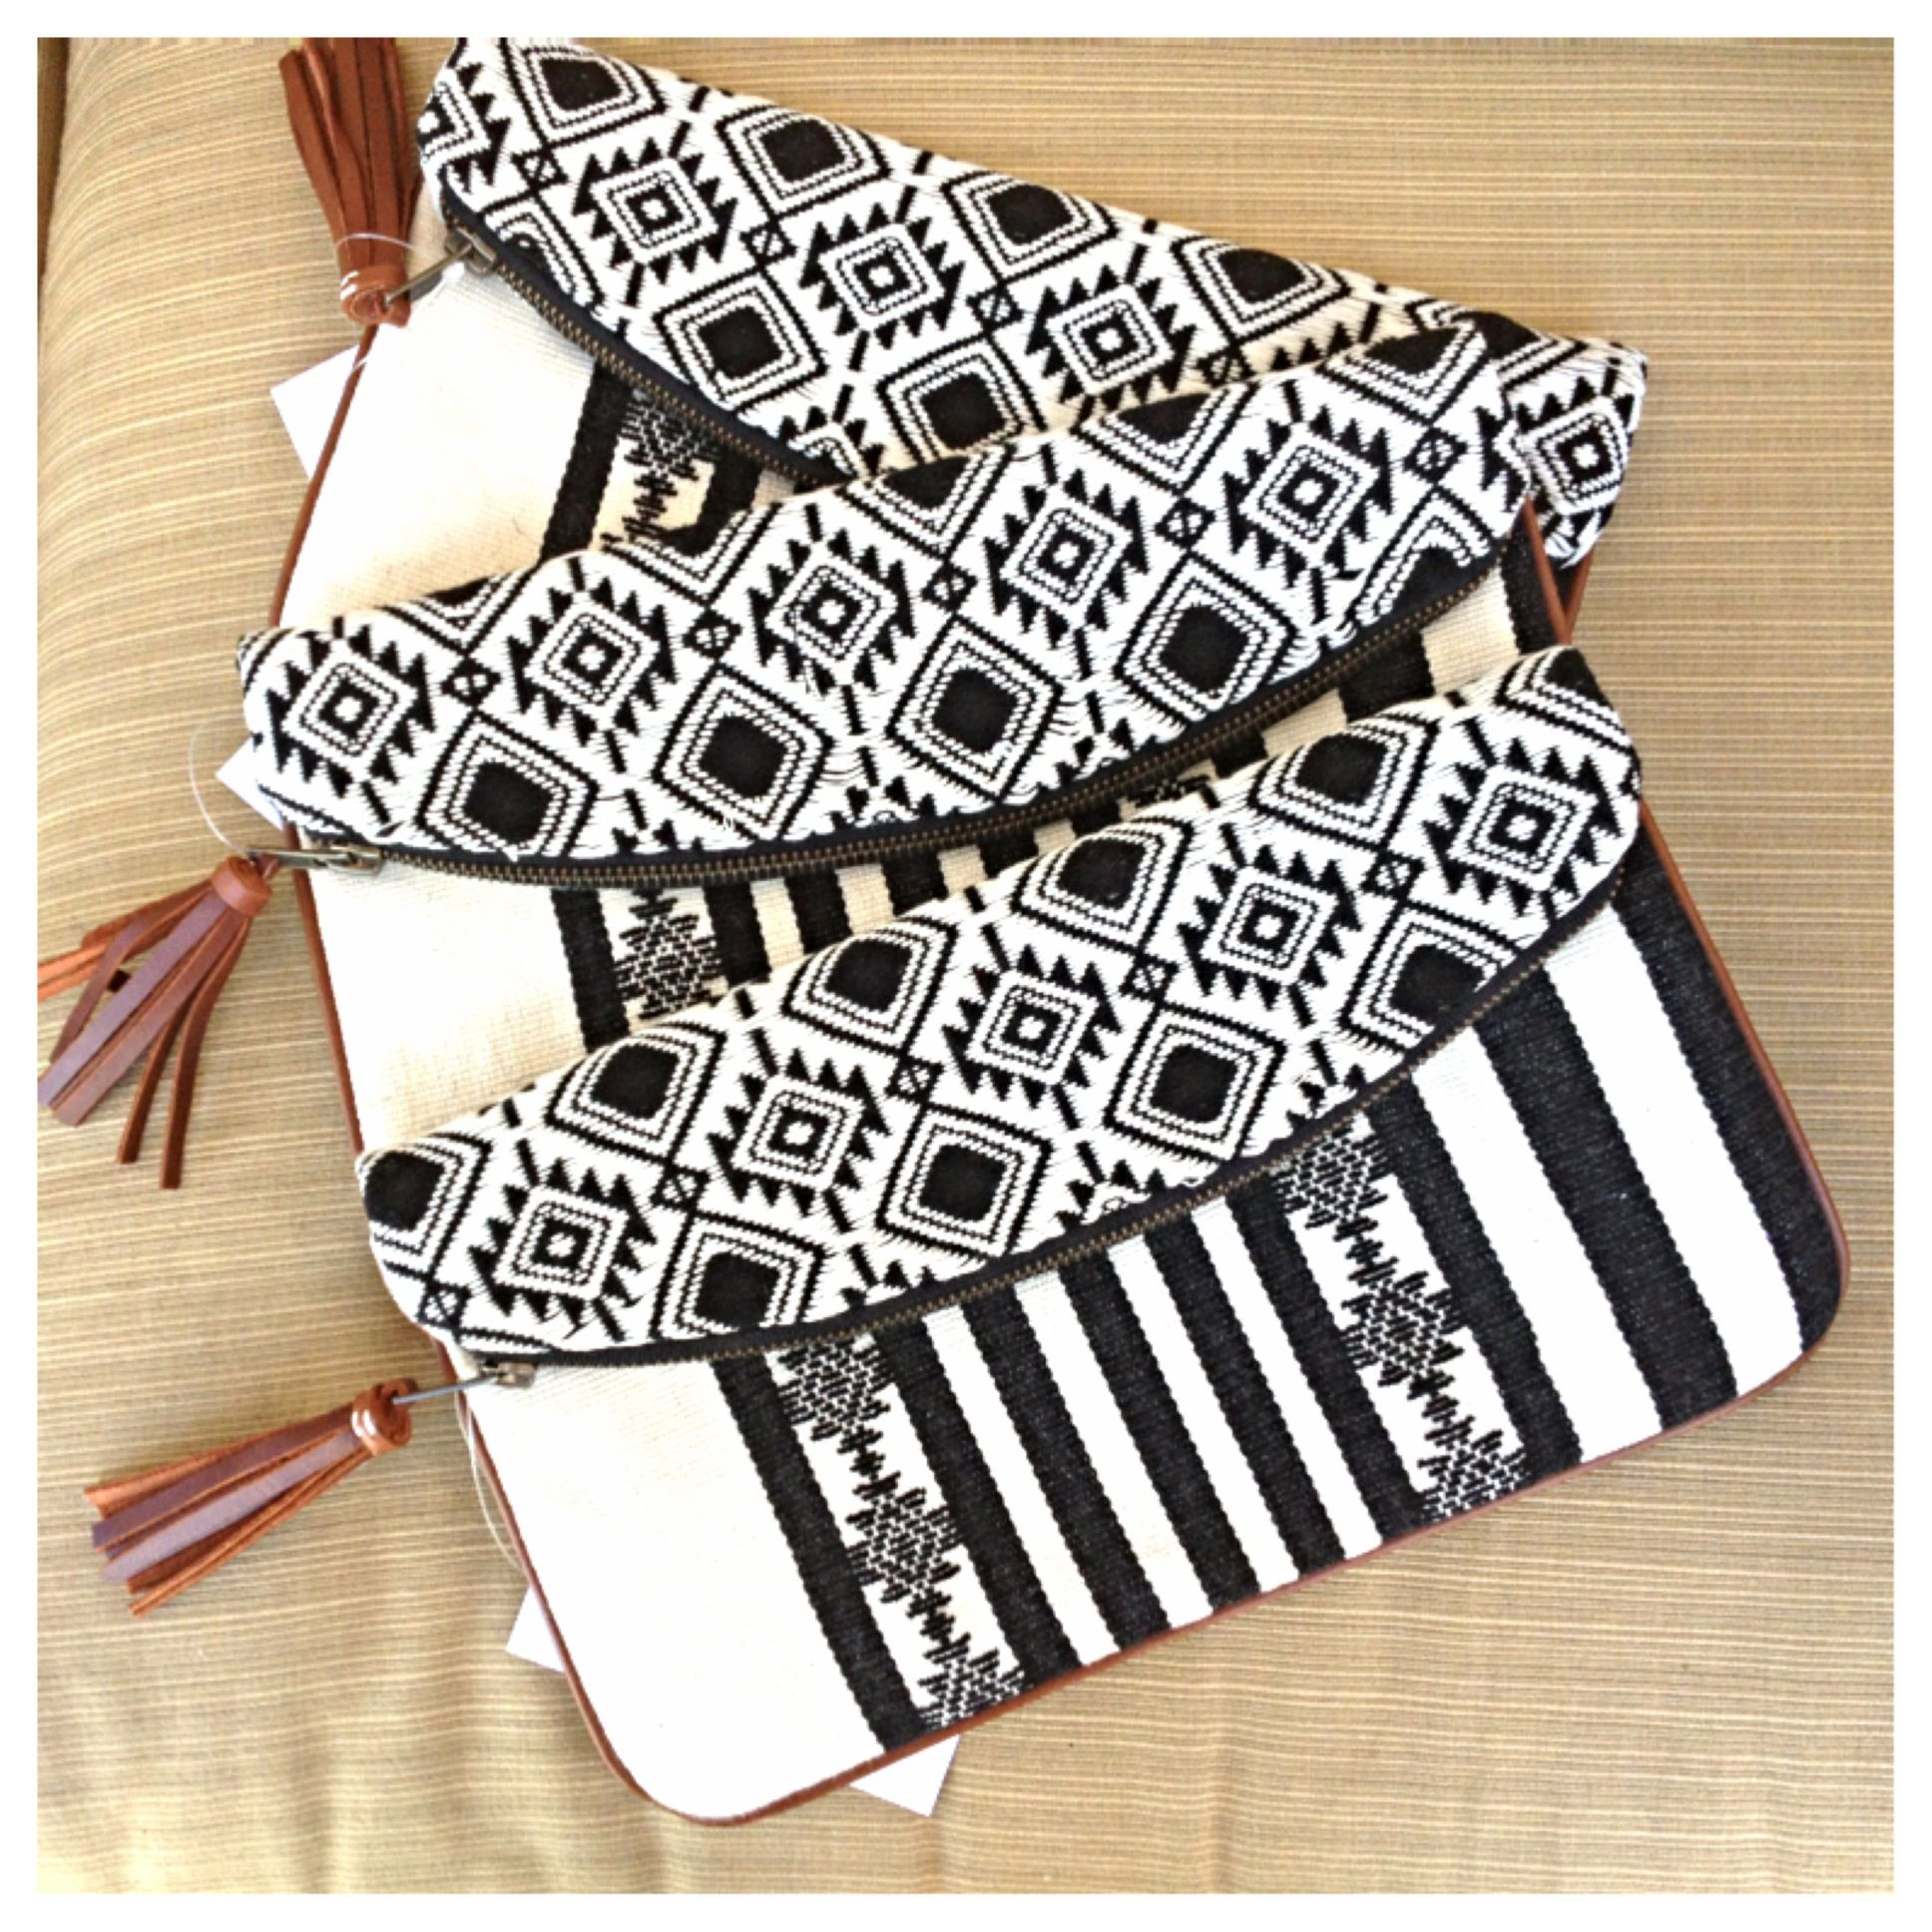 super cute clutch bags from mercado global hand woven in super cute clutch bags from mercado global hand woven in